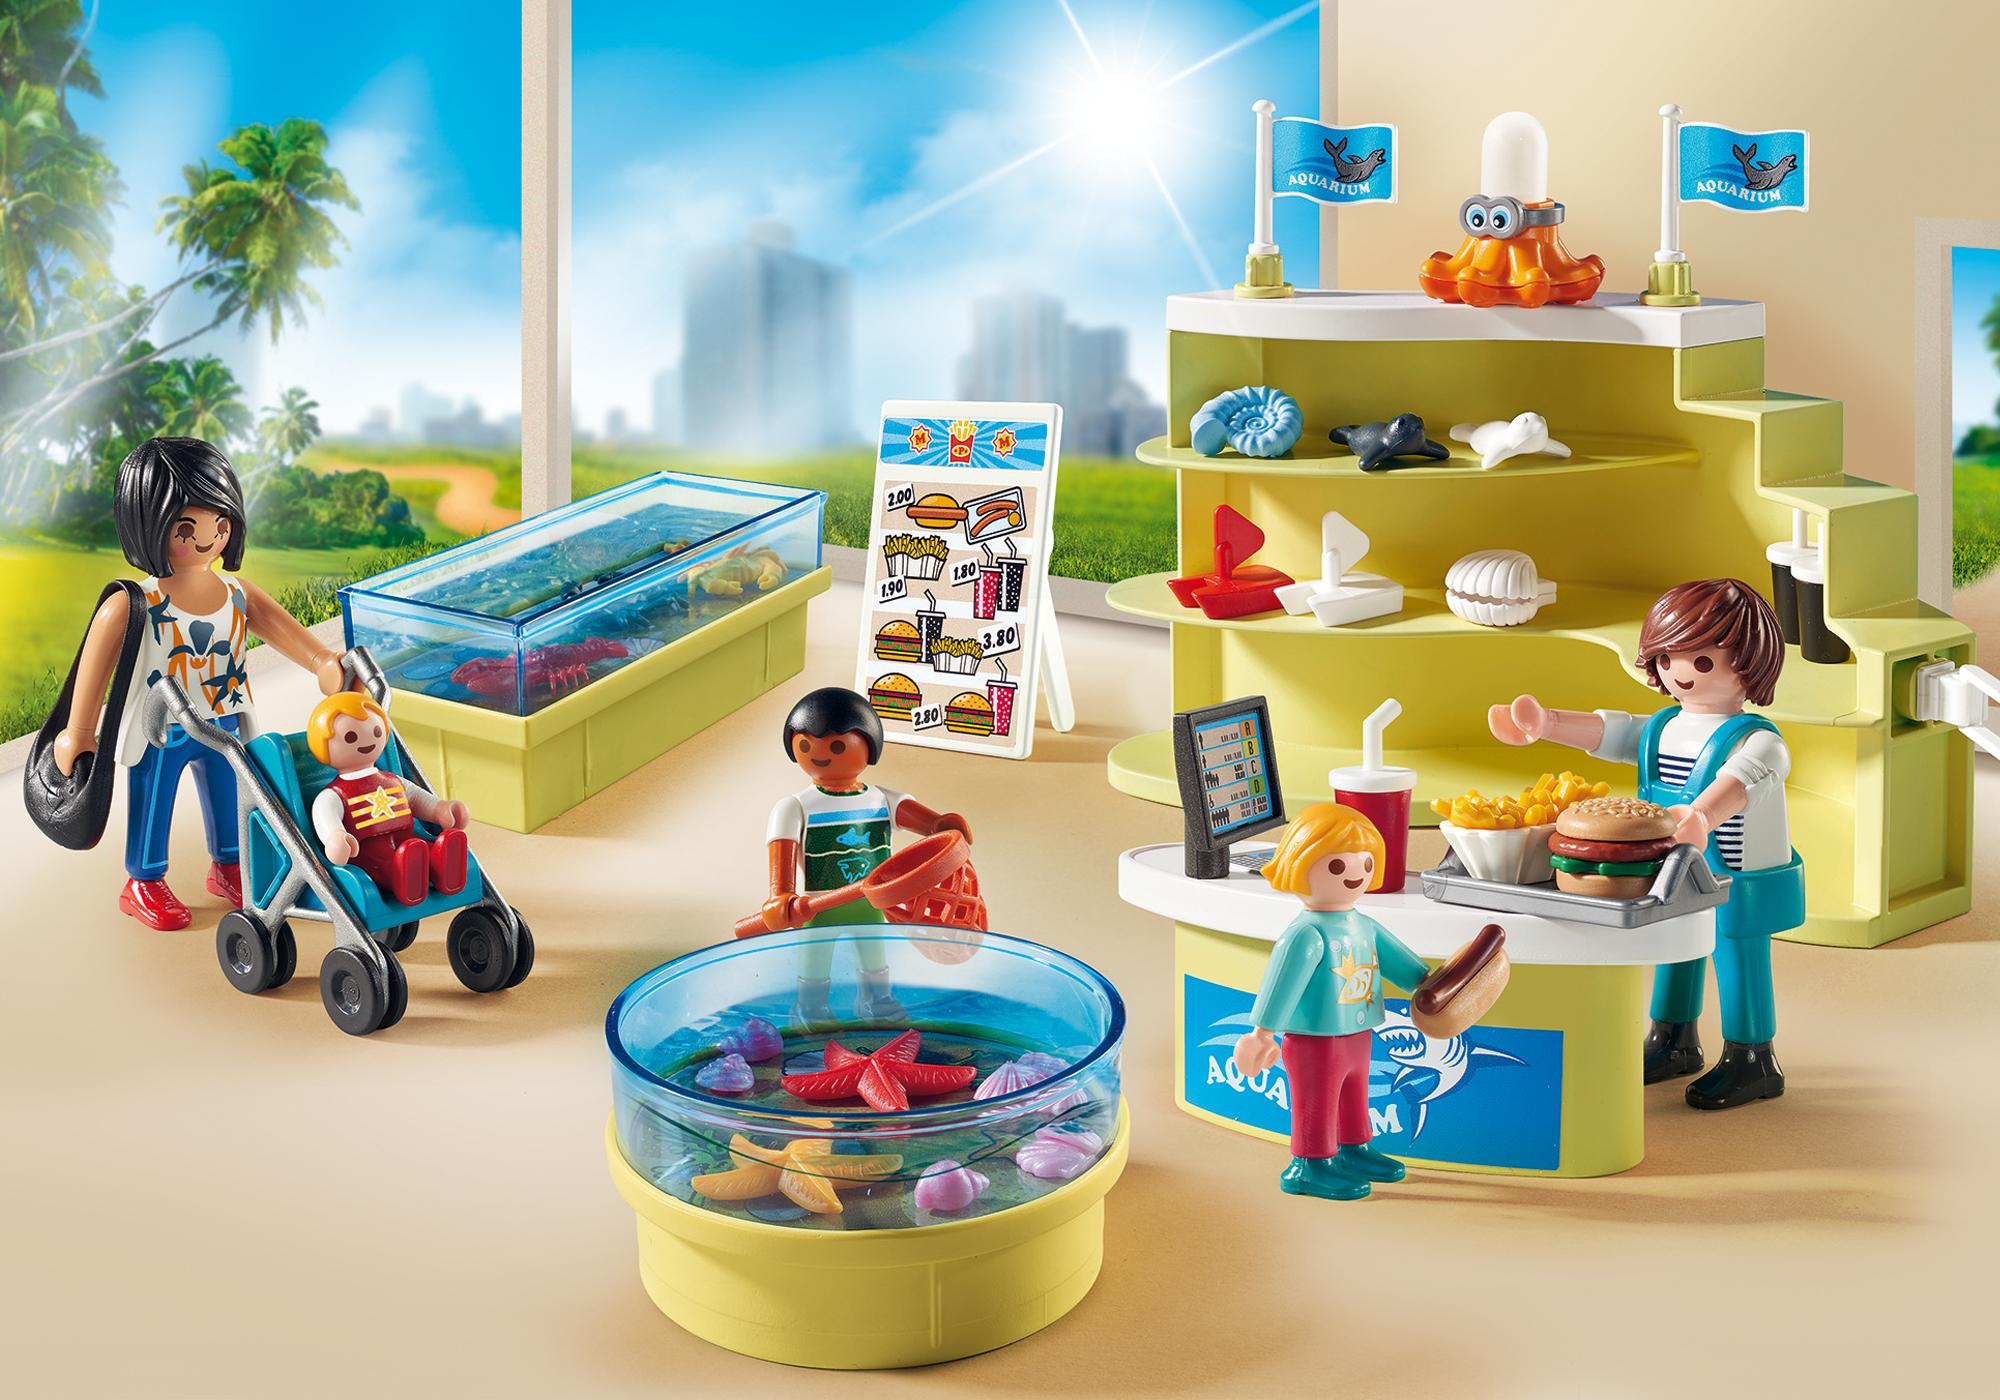 9061_product_detail/Aquarium-Shop